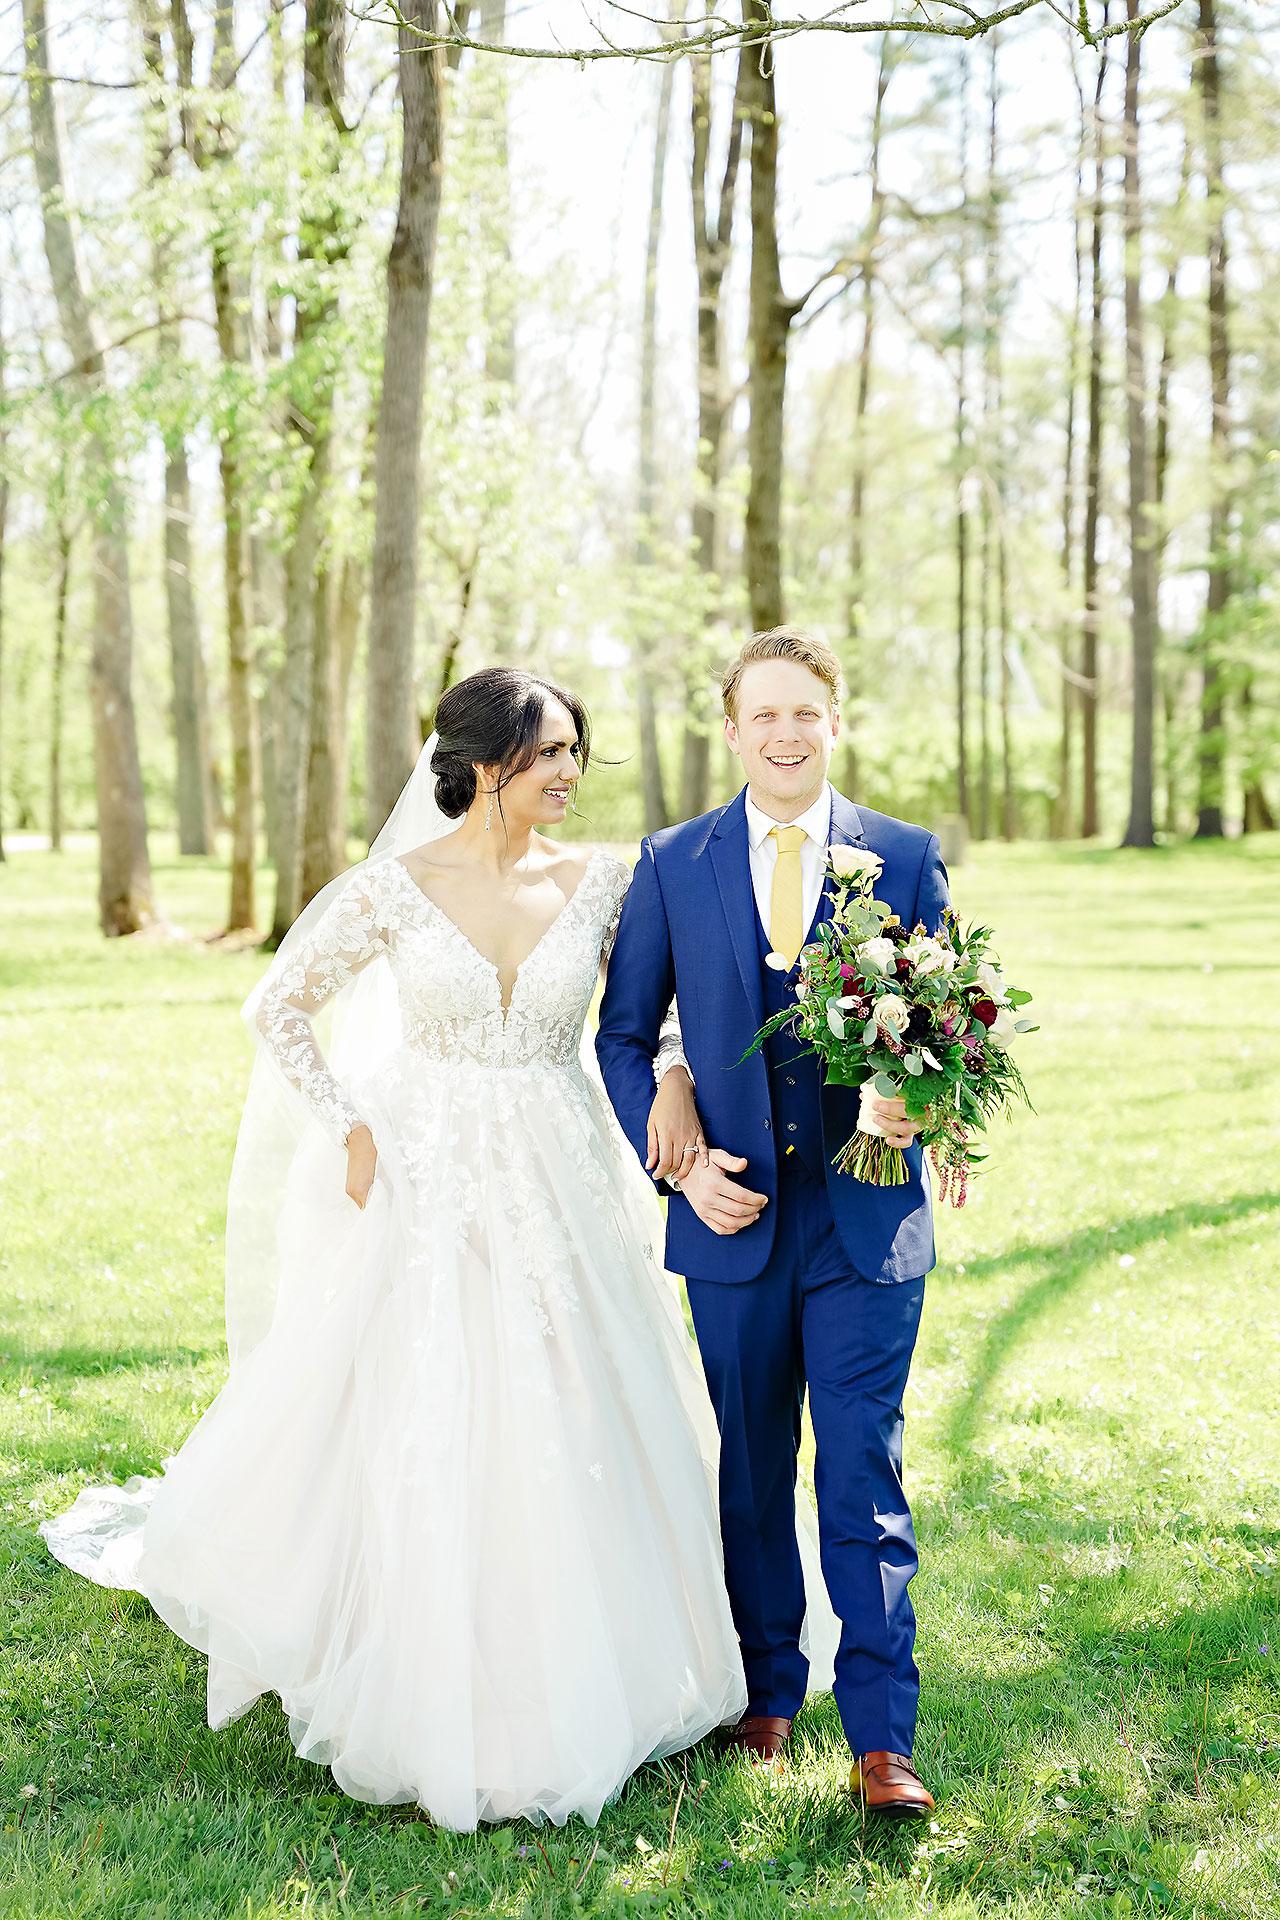 Nadia Parker Black Iris Estate Carmel Indiana Wedding May 2021 077